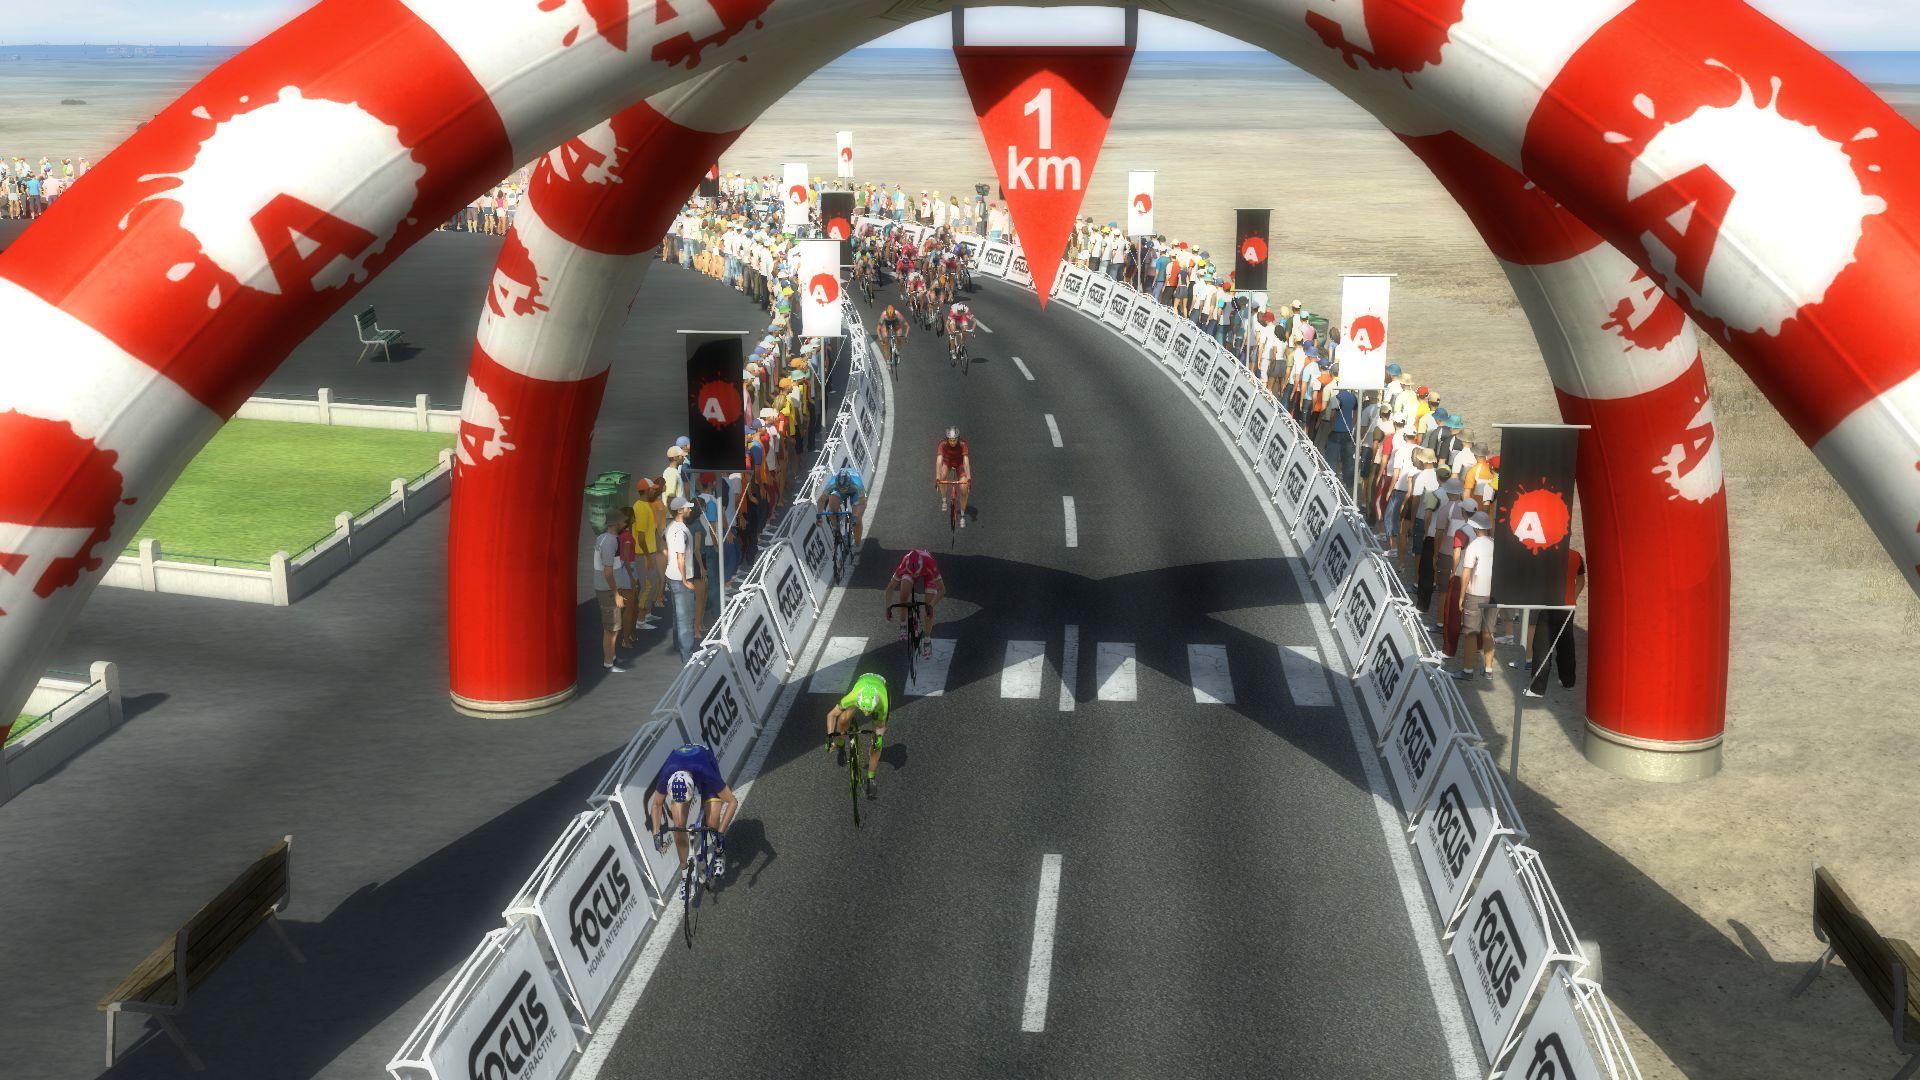 pcmdaily.com/images/mg/2019/Races/PT/Qatar/mg19_qat_s01_13.jpg